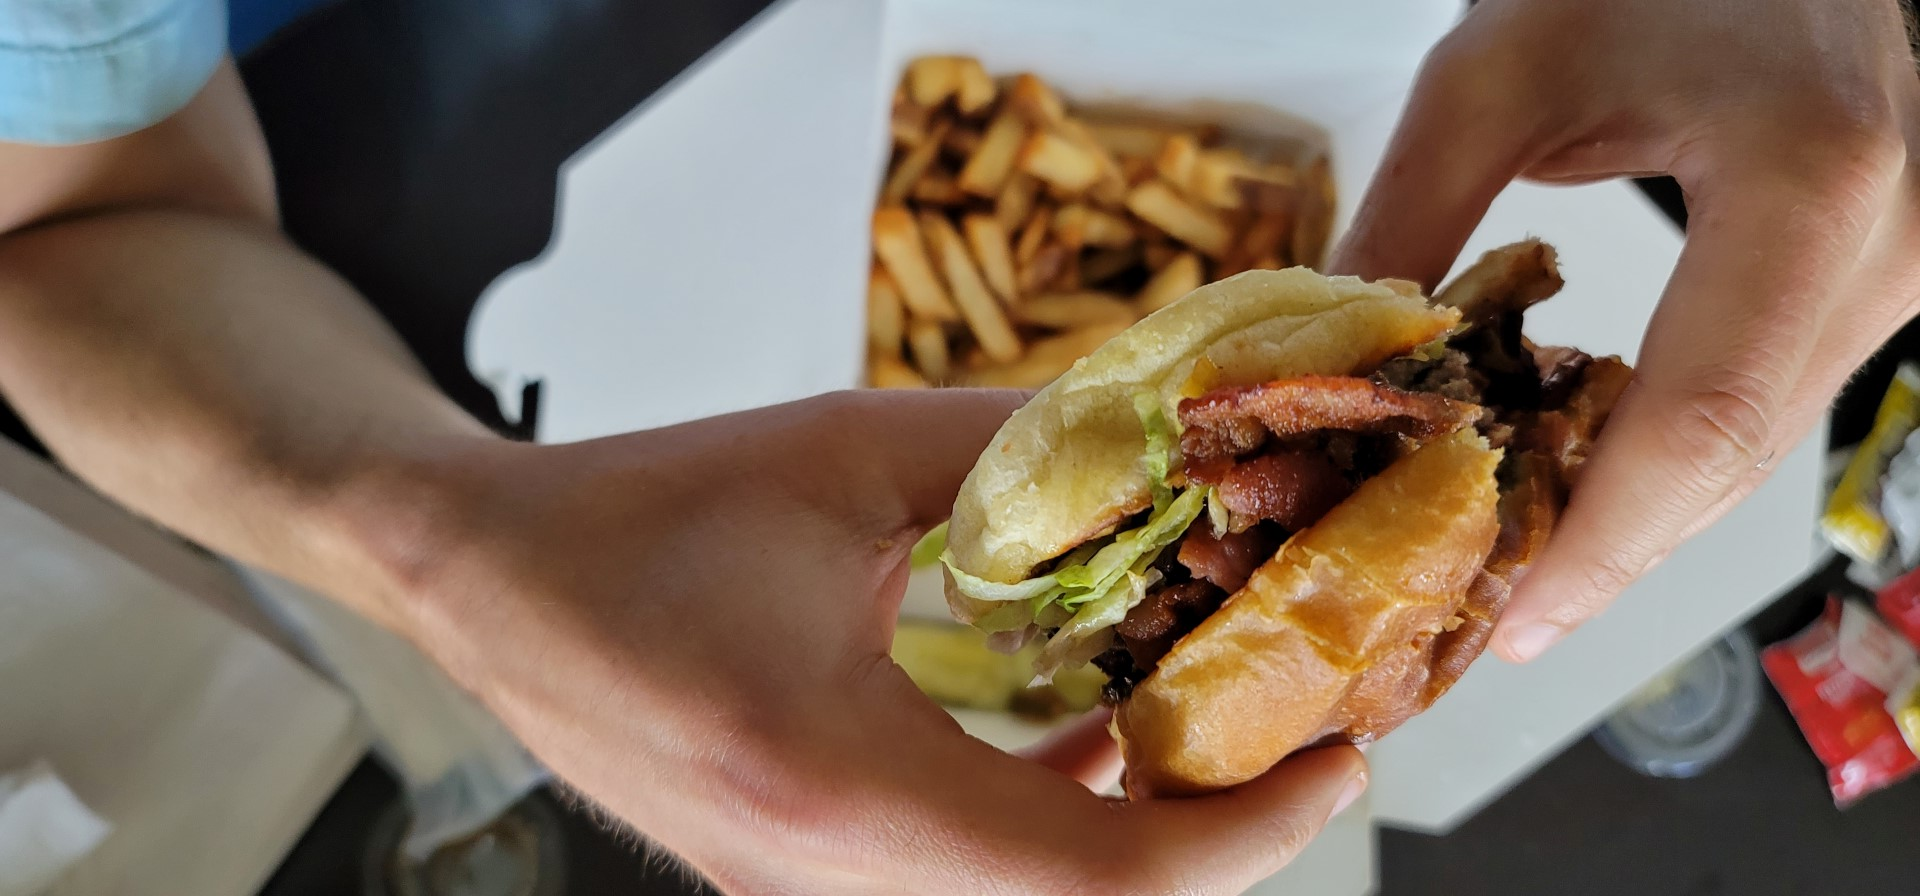 hands holding burger